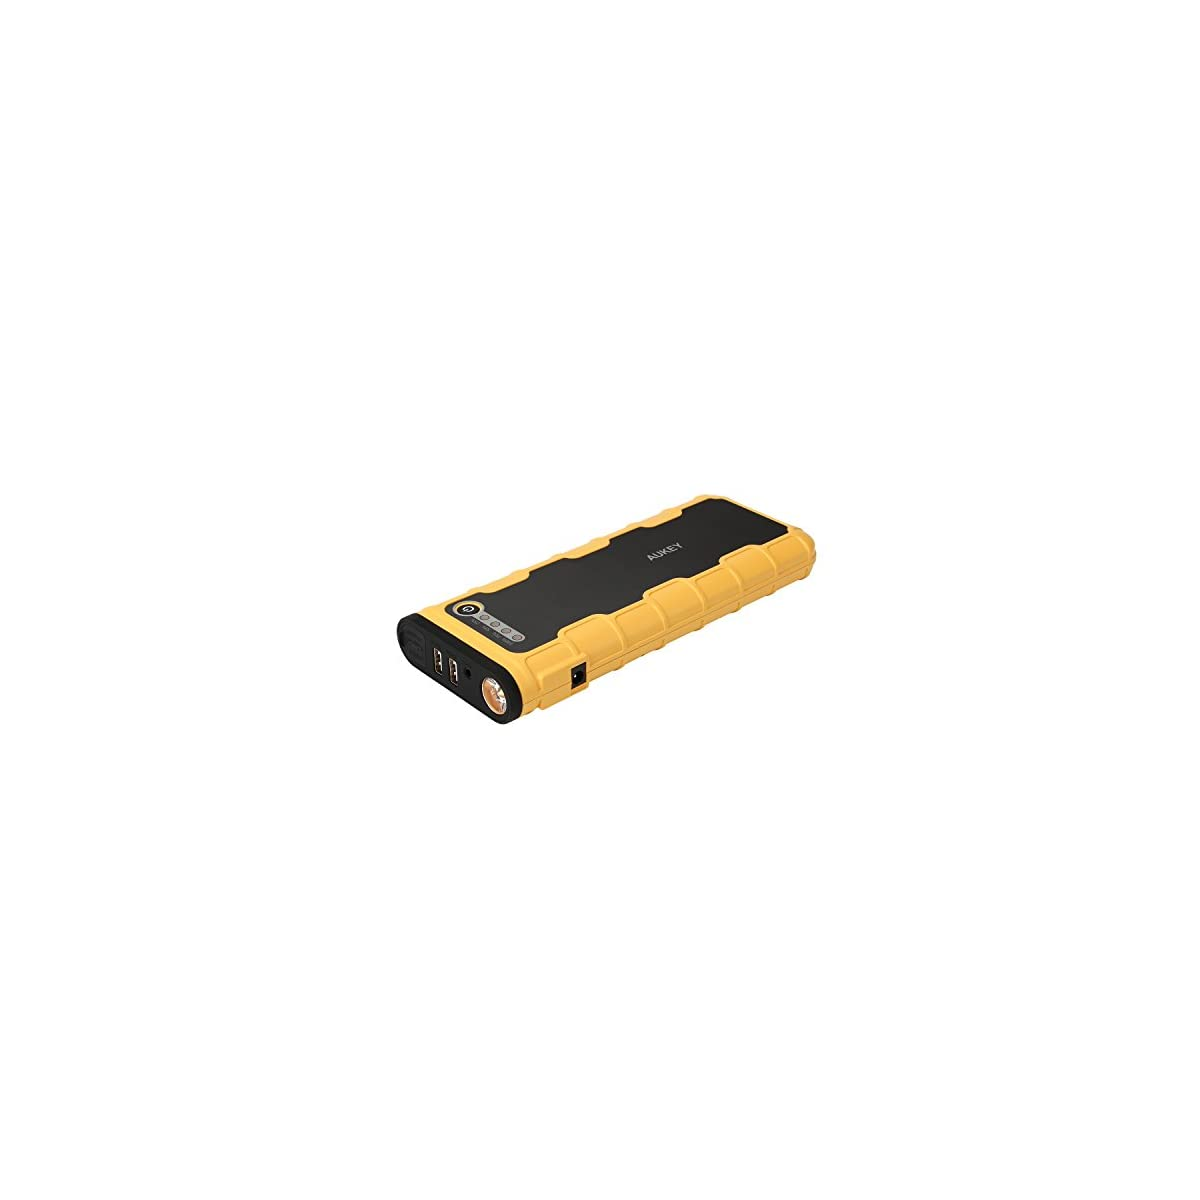 41Qmm1JVXiL. SS1200  - Satacnut Protector de Pantalla Cristal Templado Premium [Anti-Scratch] [9H Dureza] Vidrio Templado ZJDPEFE072